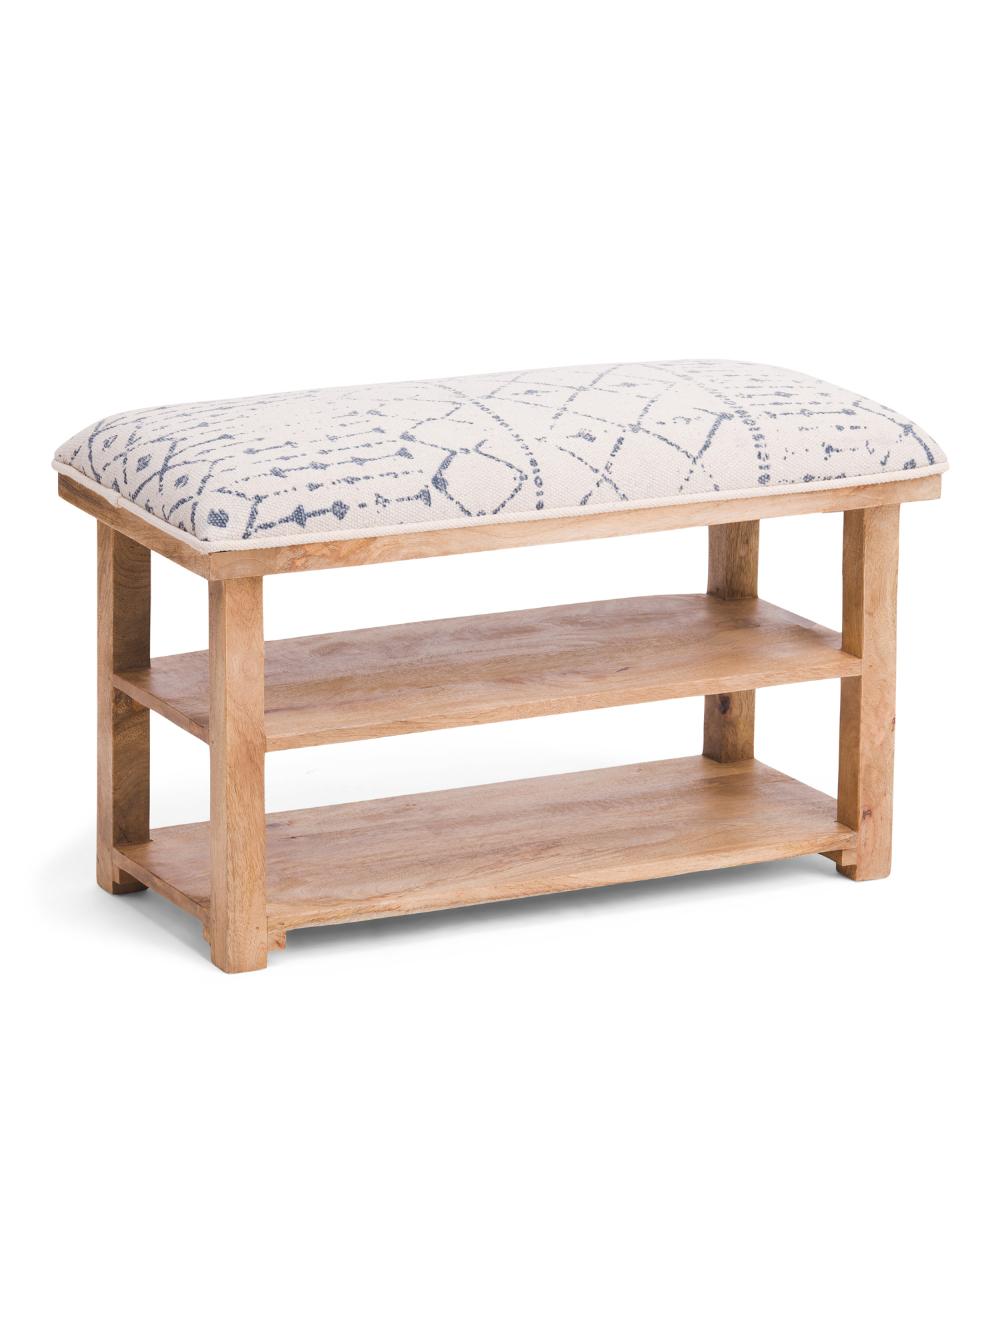 Boho Bench With Storage Seating T J Maxx Bench With Storage Bench Storage [ 1333 x 1000 Pixel ]